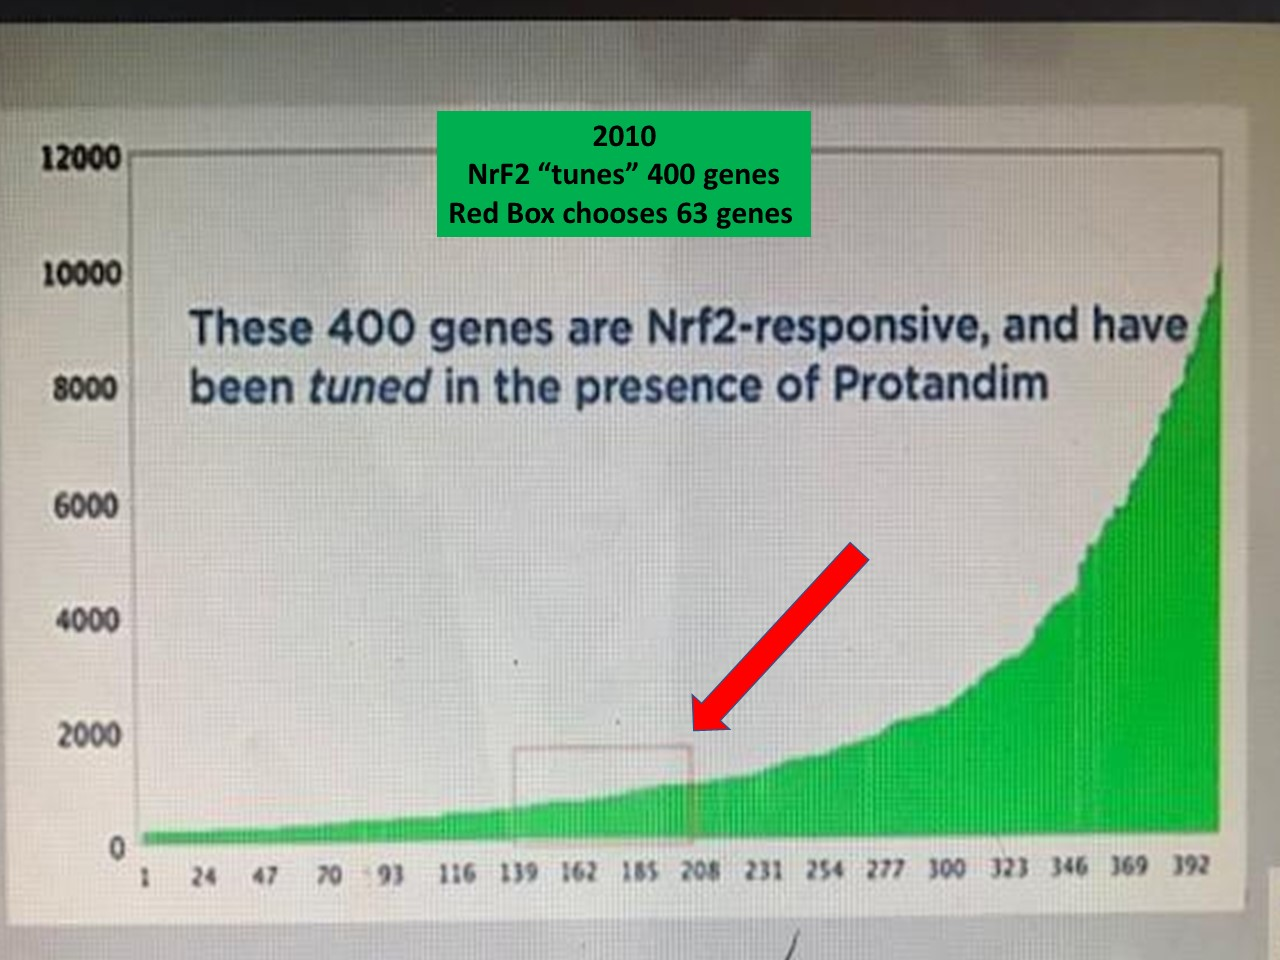 Genes and NrF2